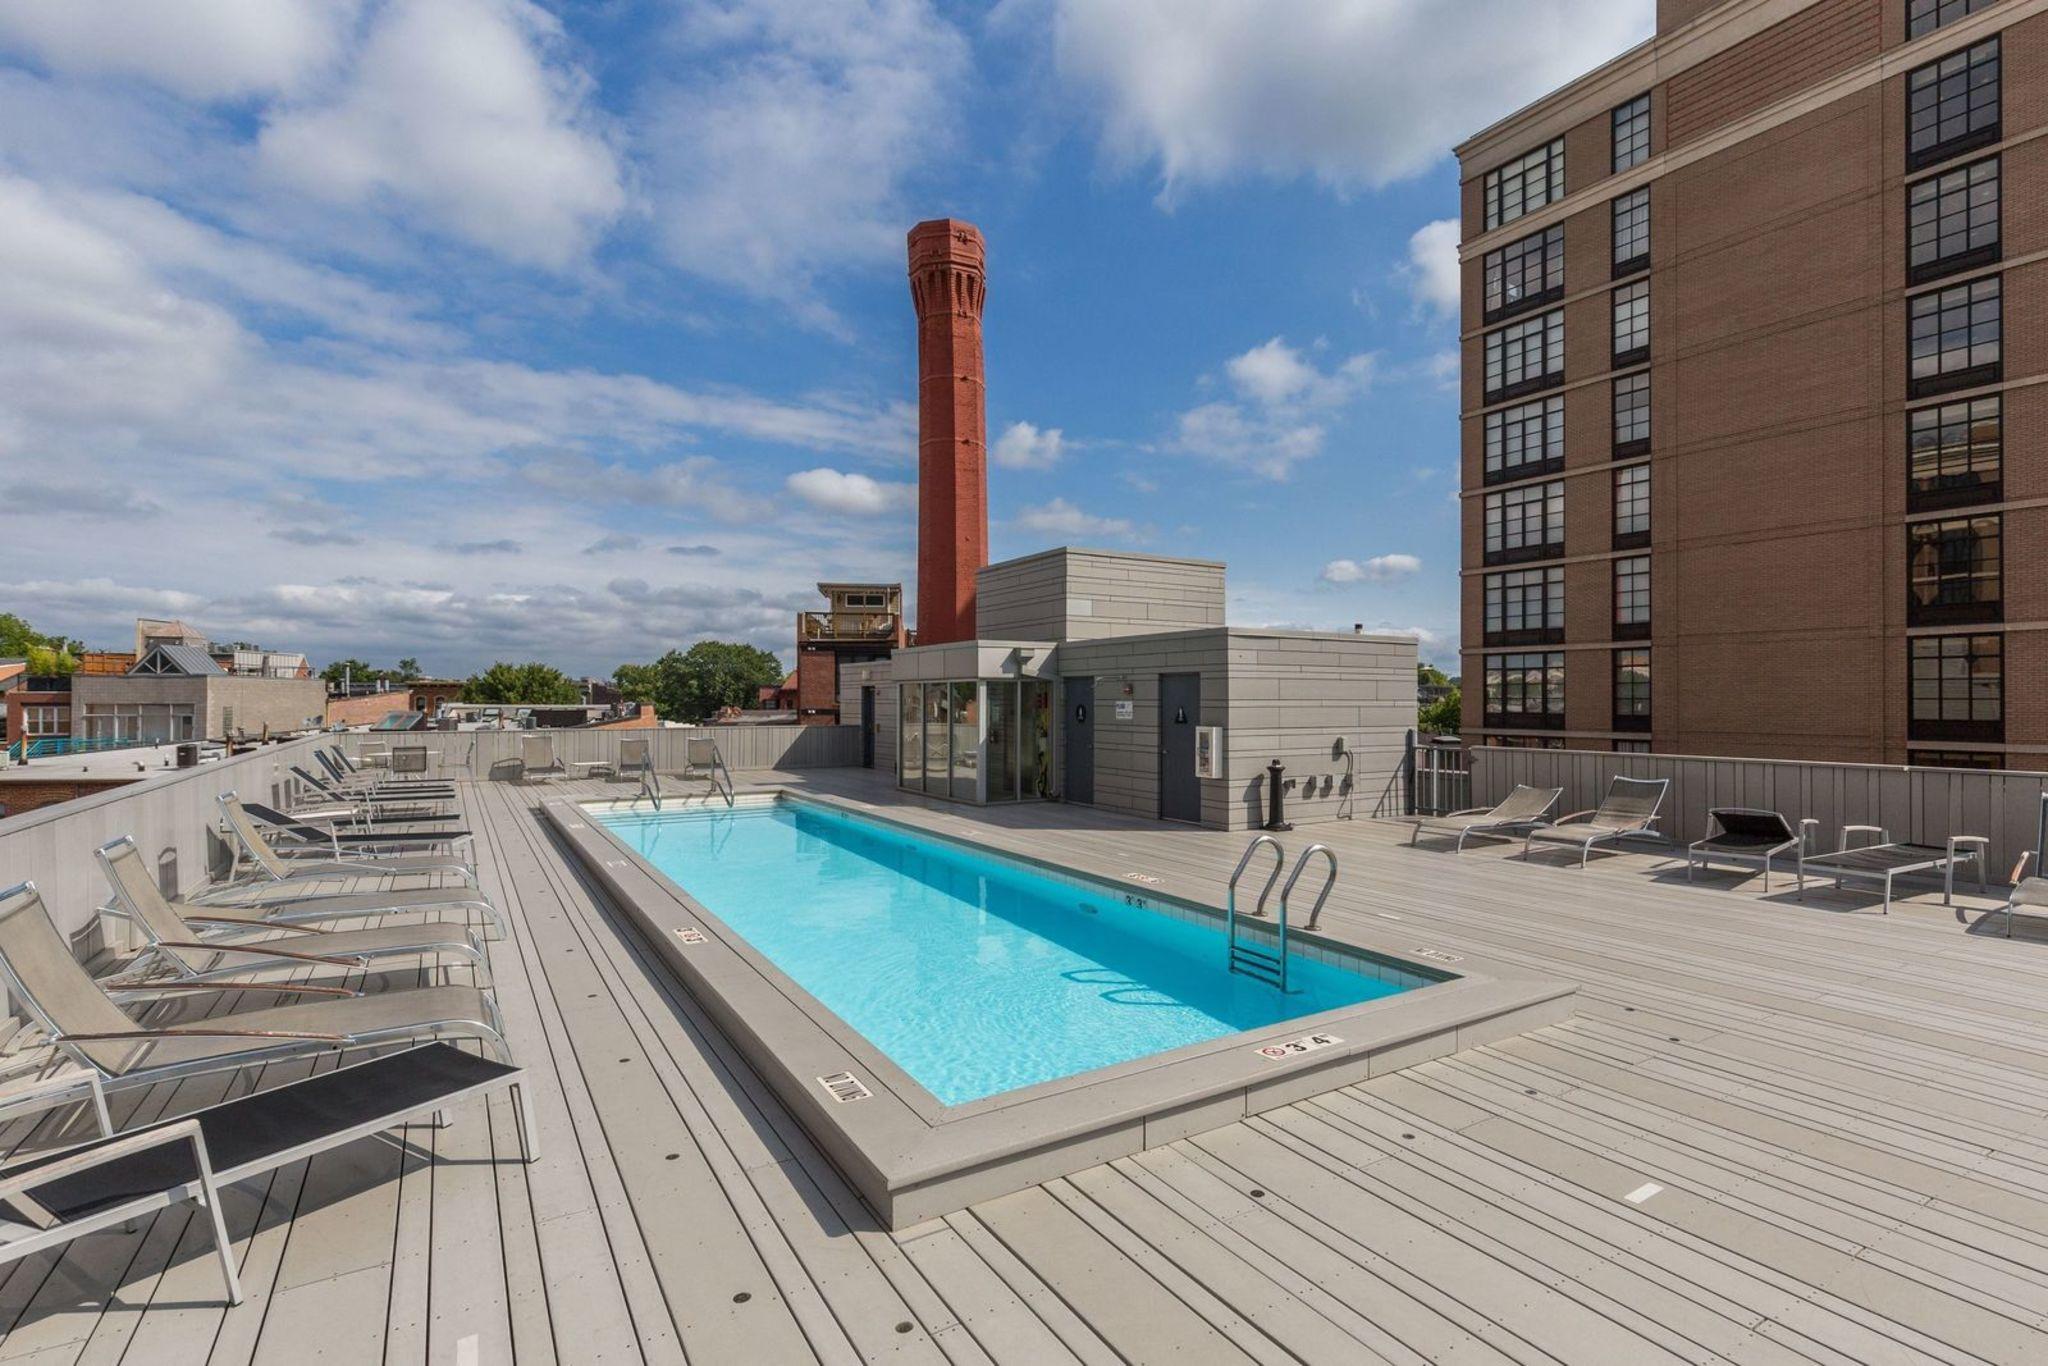 030_437_new_york_ave_nw_903-print-044-57-building_pool-3600x2400-300dpi